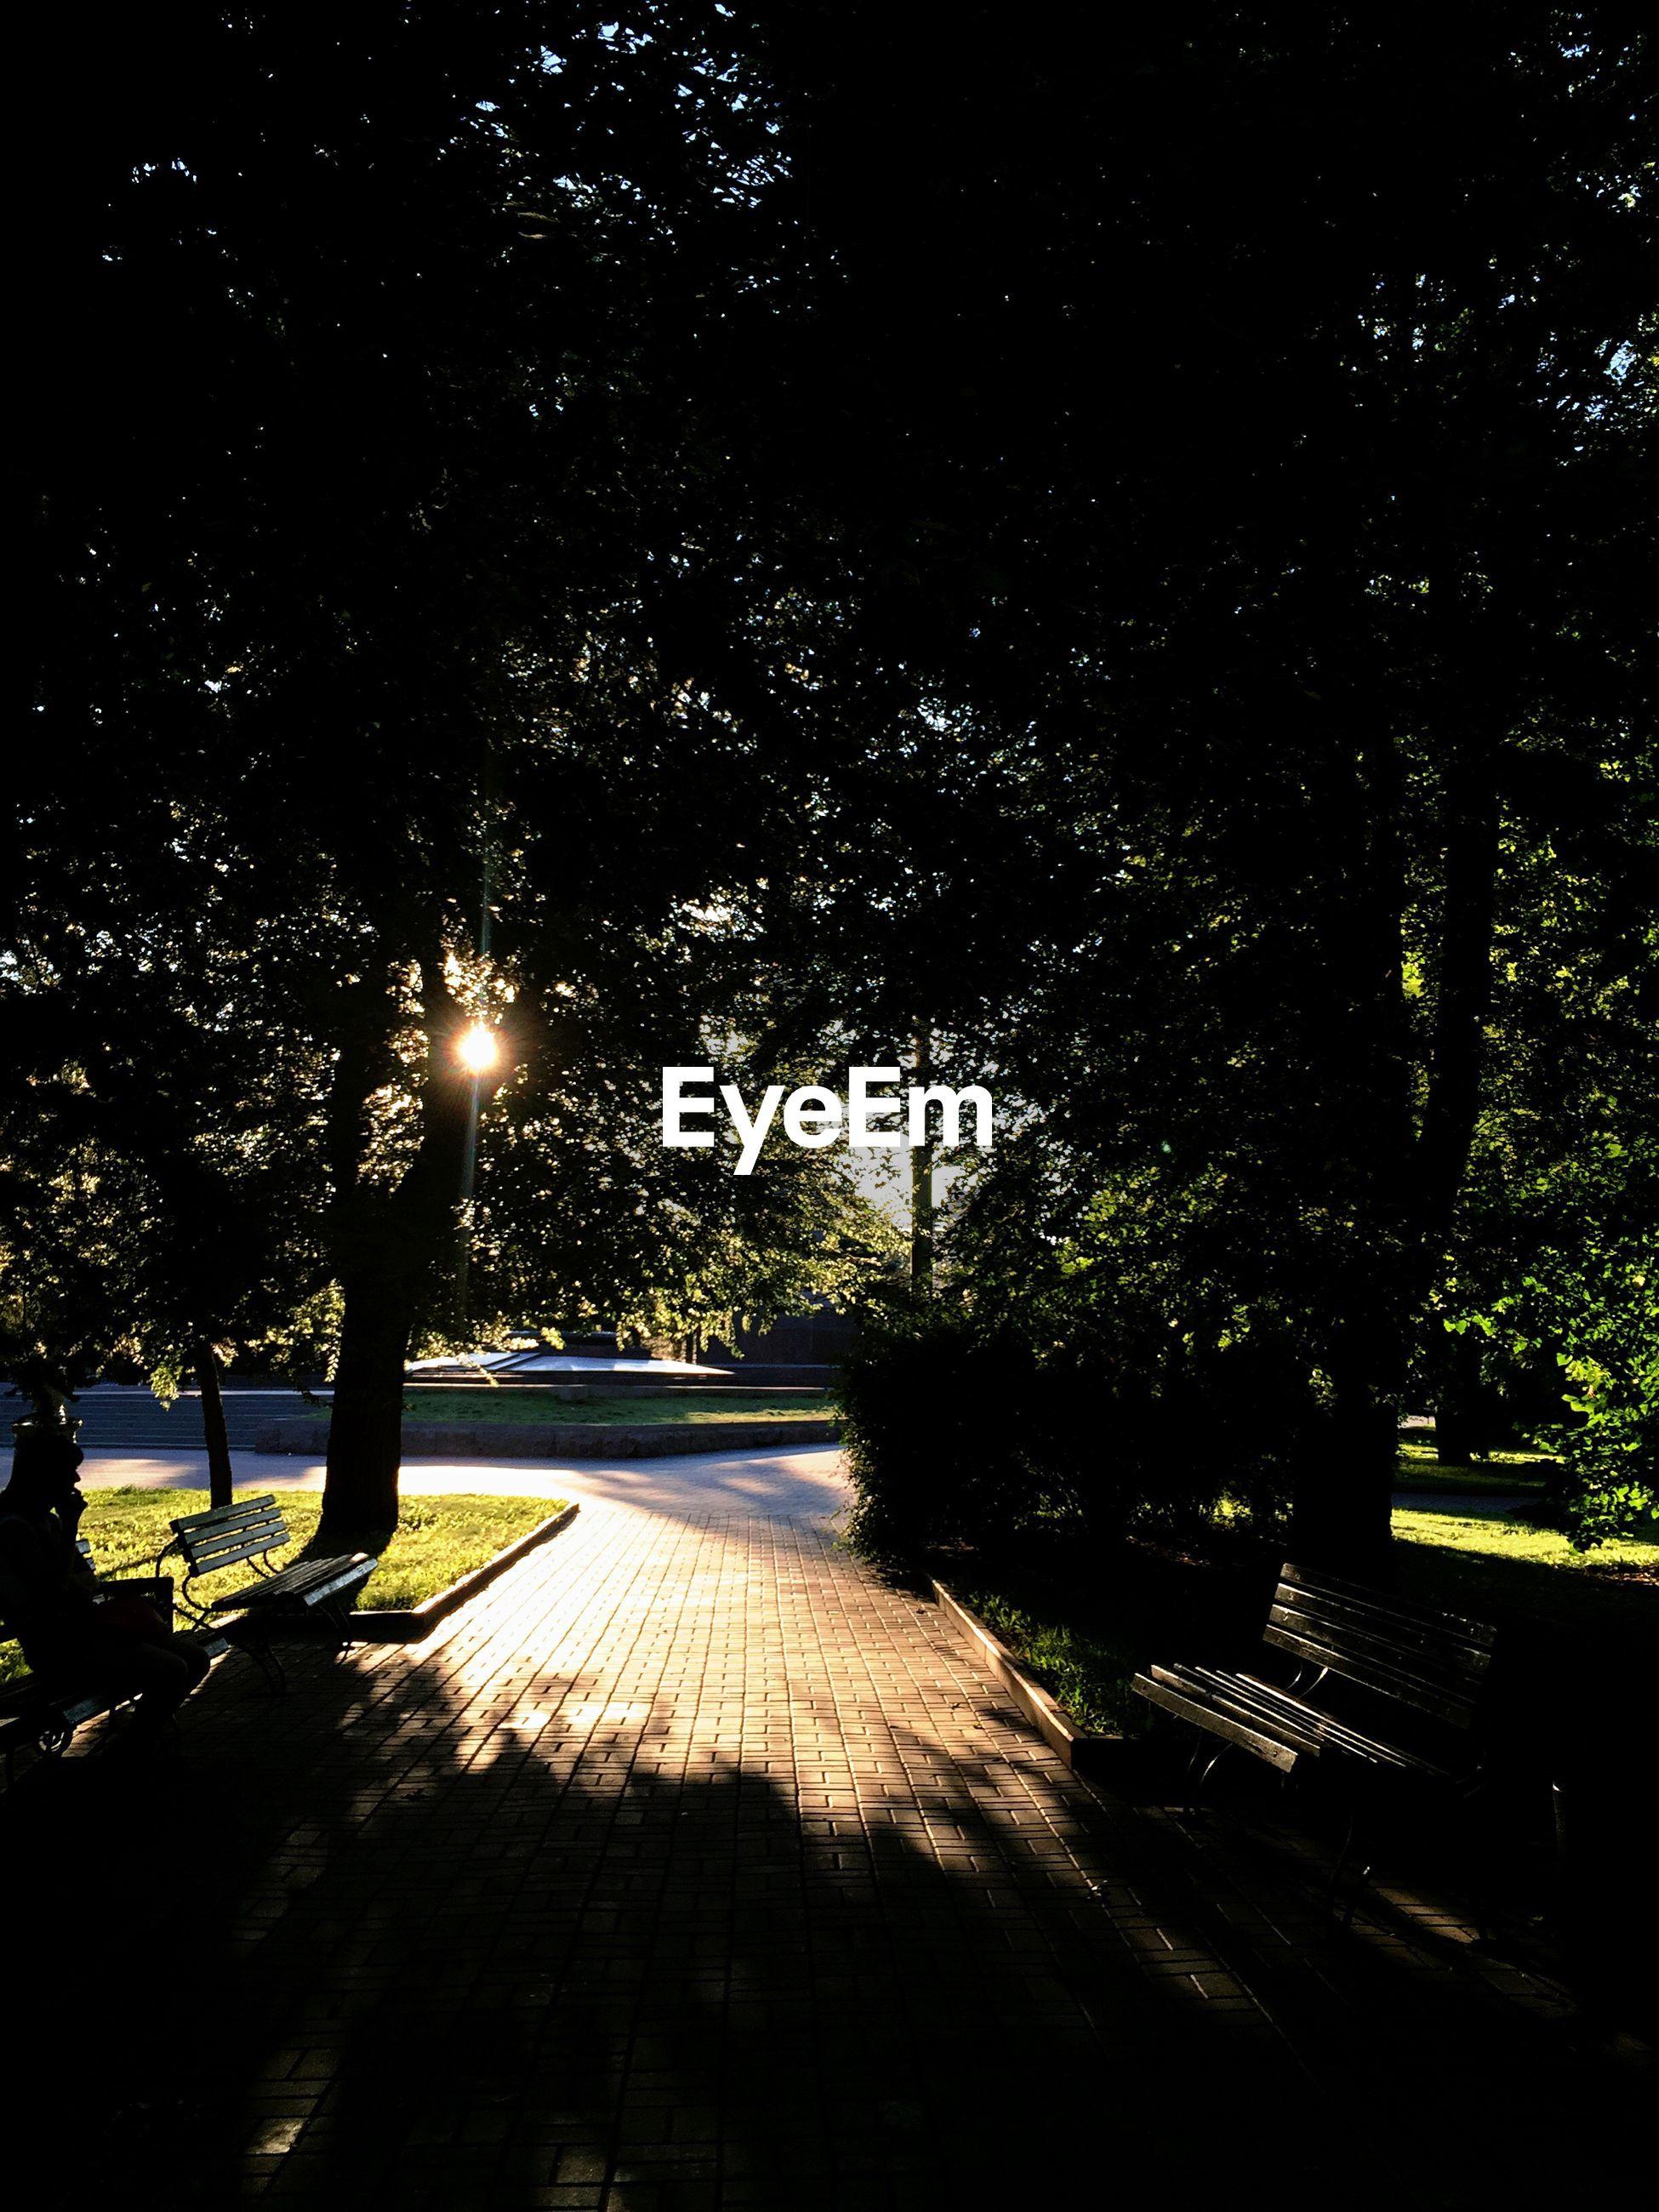 ILLUMINATED TREES AGAINST SKY WITH SUNLIGHT